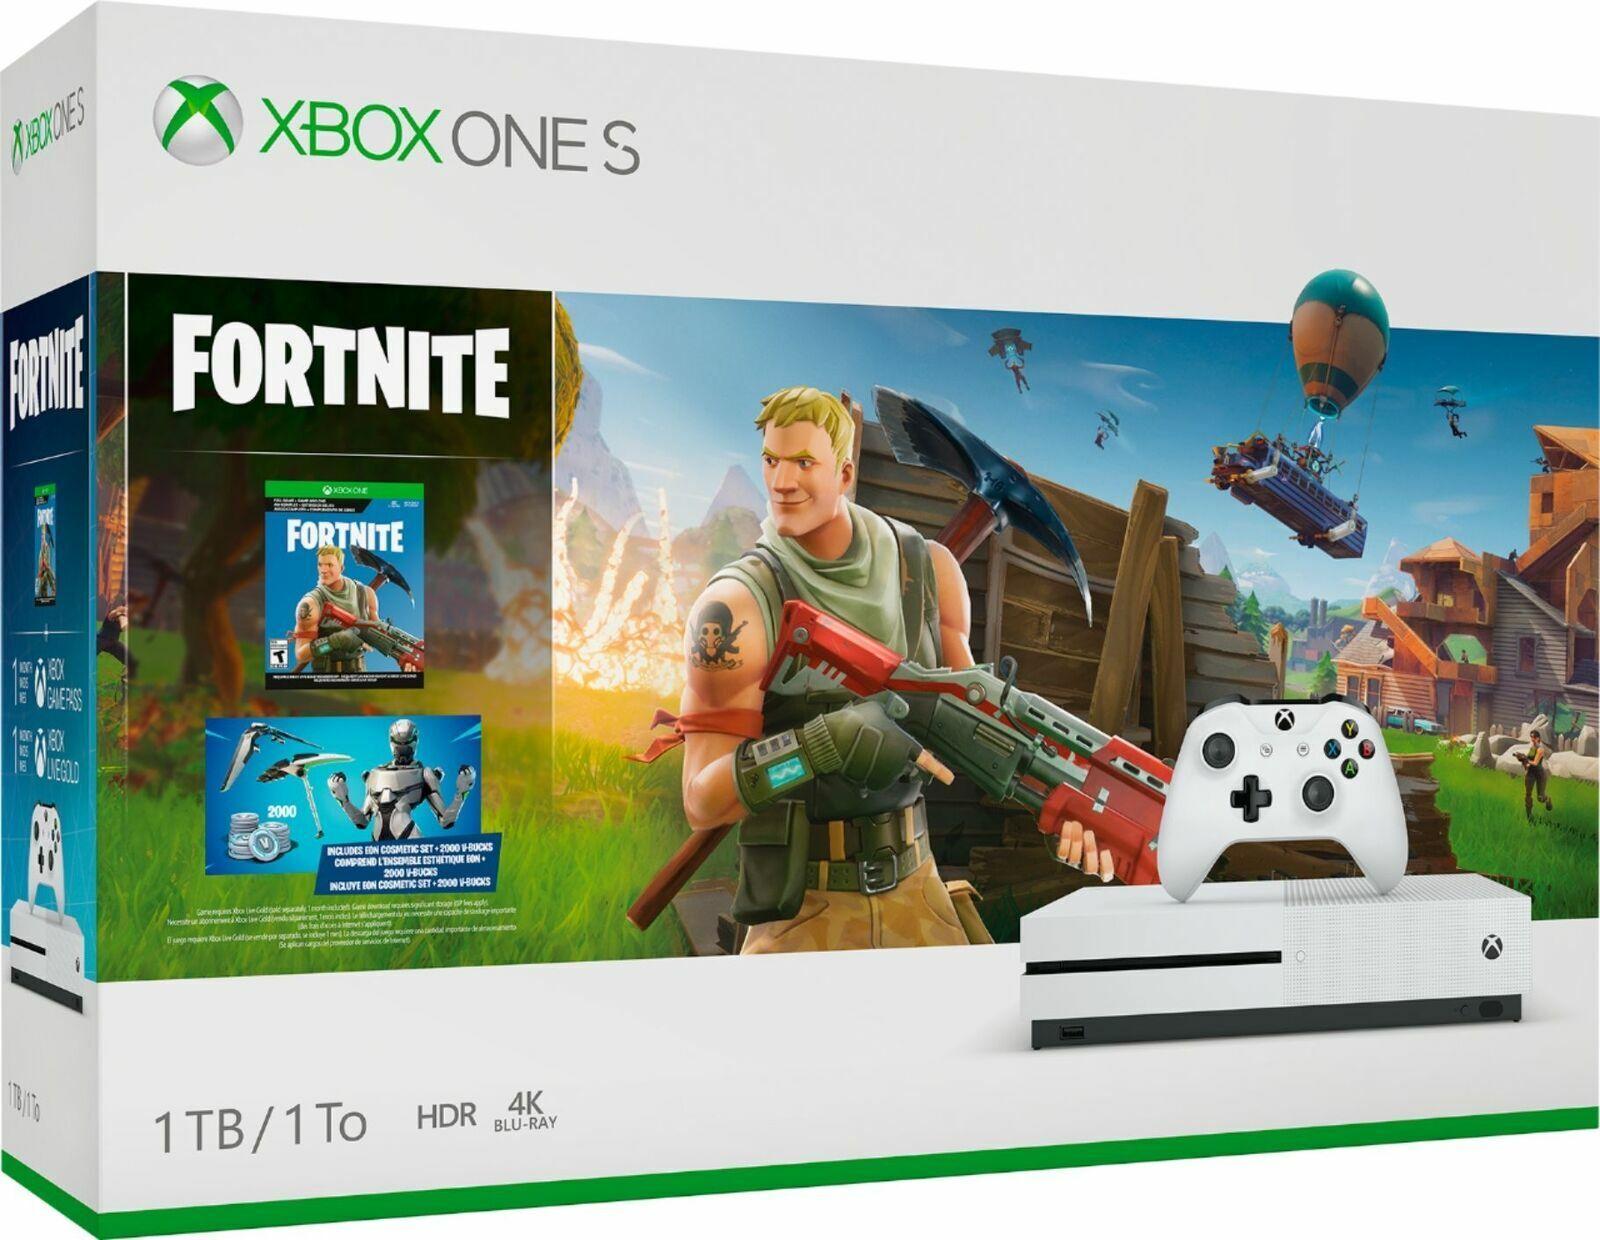 e26923f8 Microsoft Xbox One S 1TB White Console (NTSC) Bundle with Fortnite ...